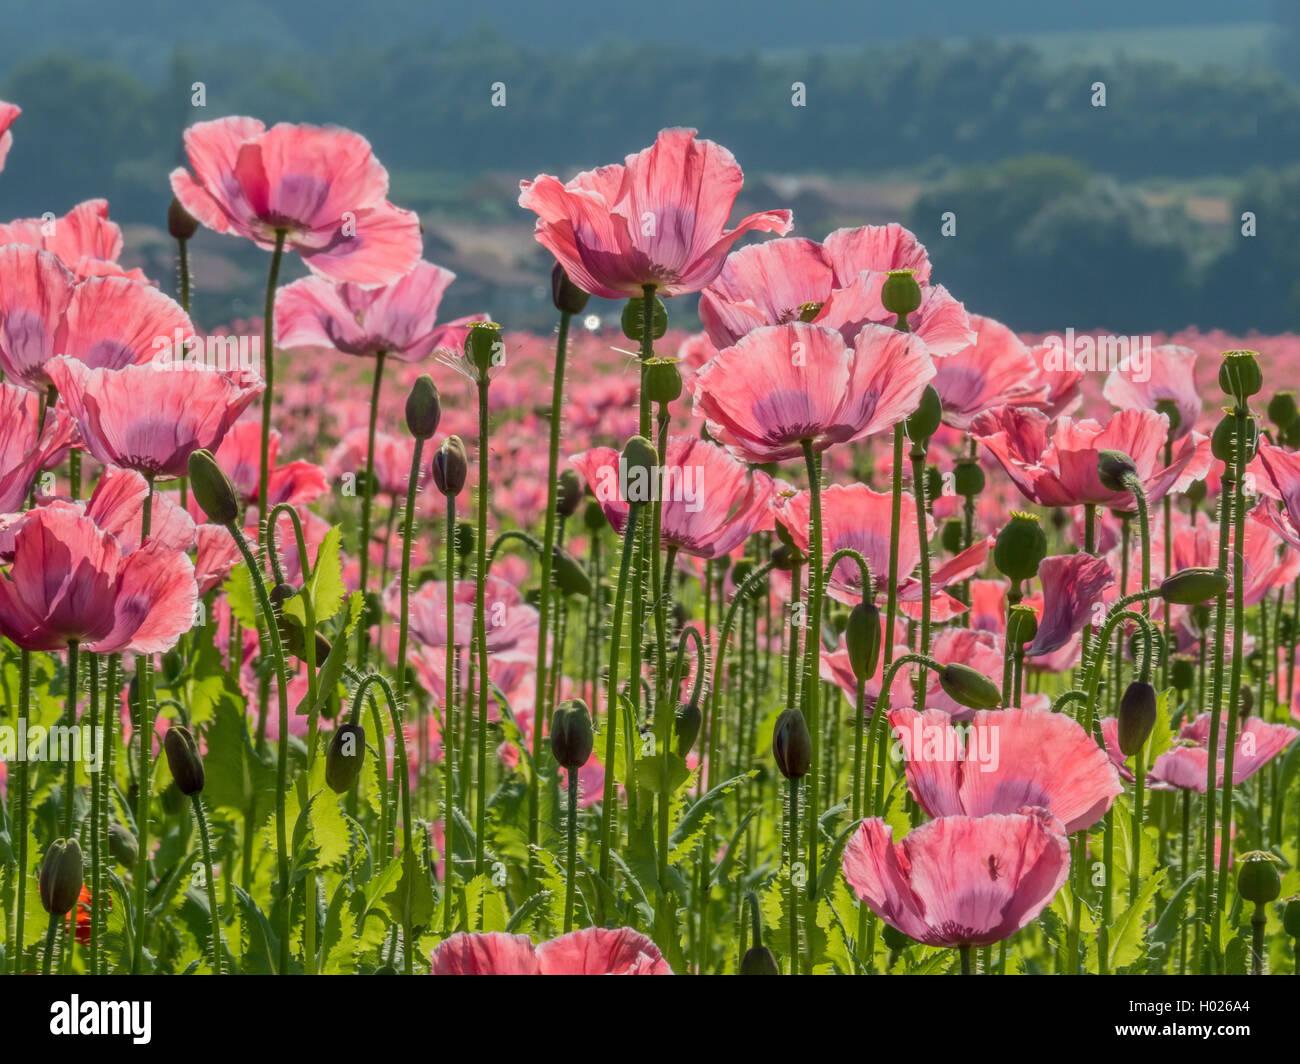 opium poppy (Papaver somniferum), blooming field, Austria Stock Photo